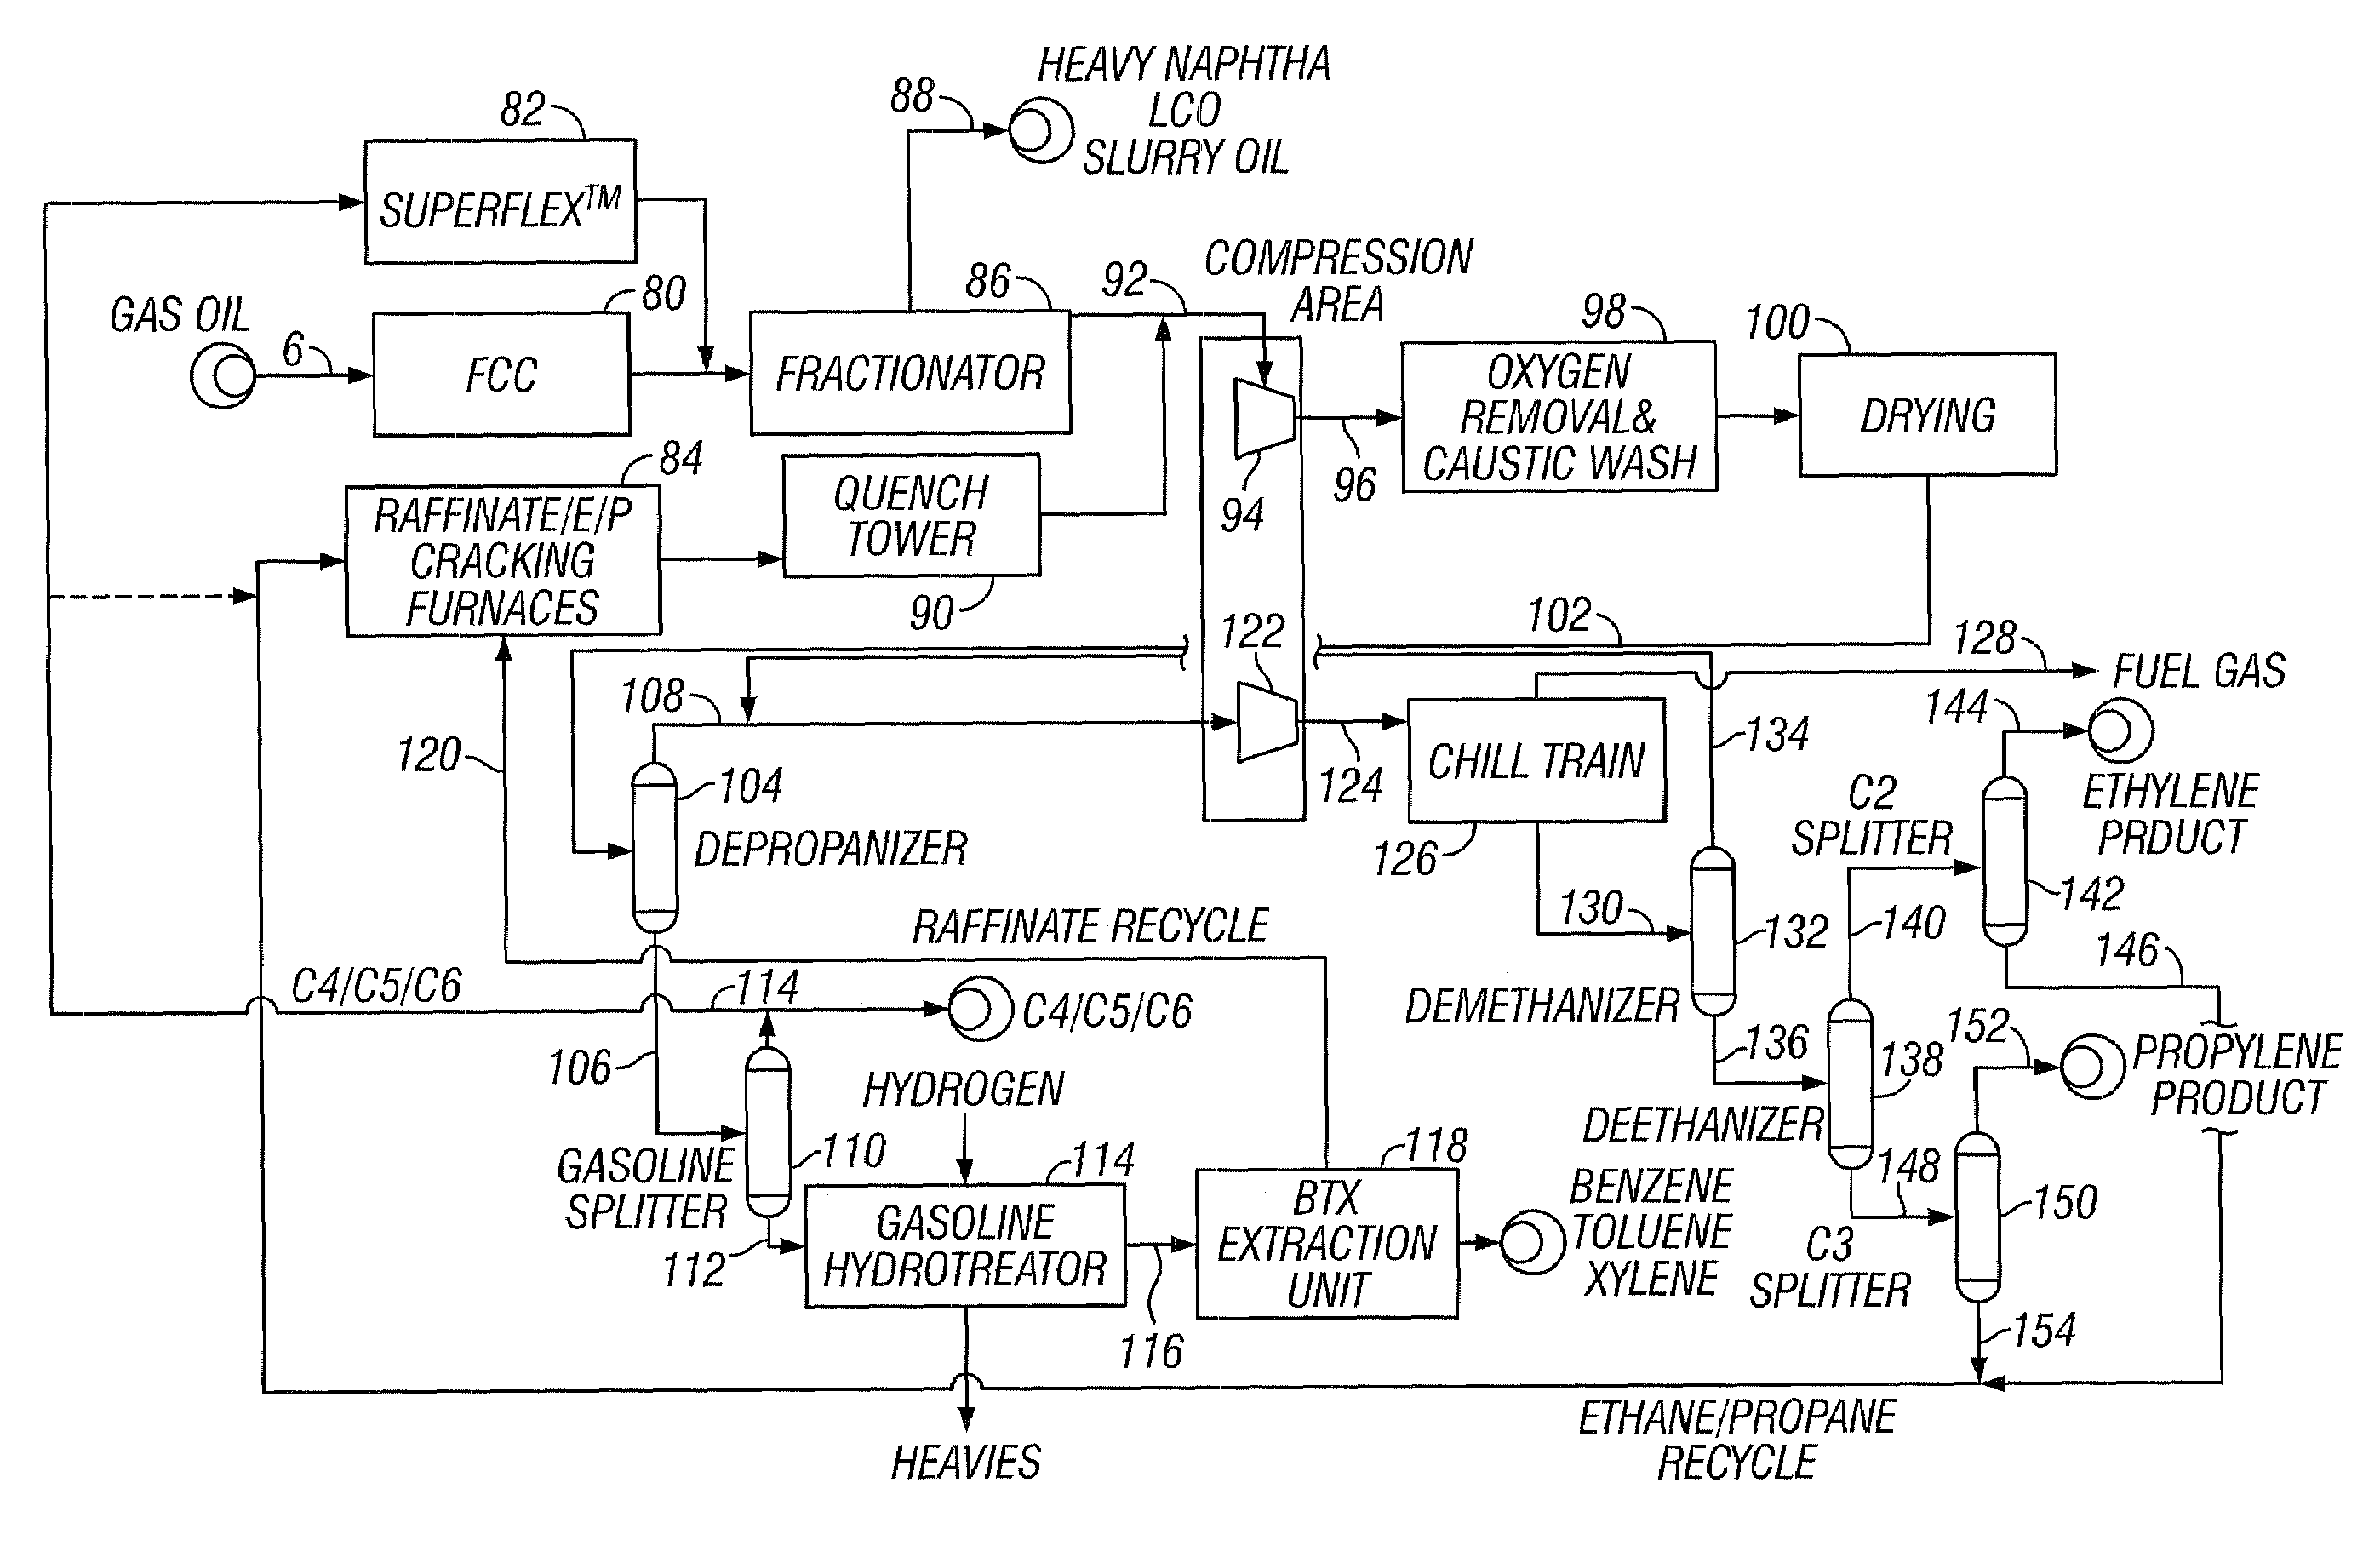 fischer tropsch process flow diagram ceiling fan switch wiring australia olefins free engine image